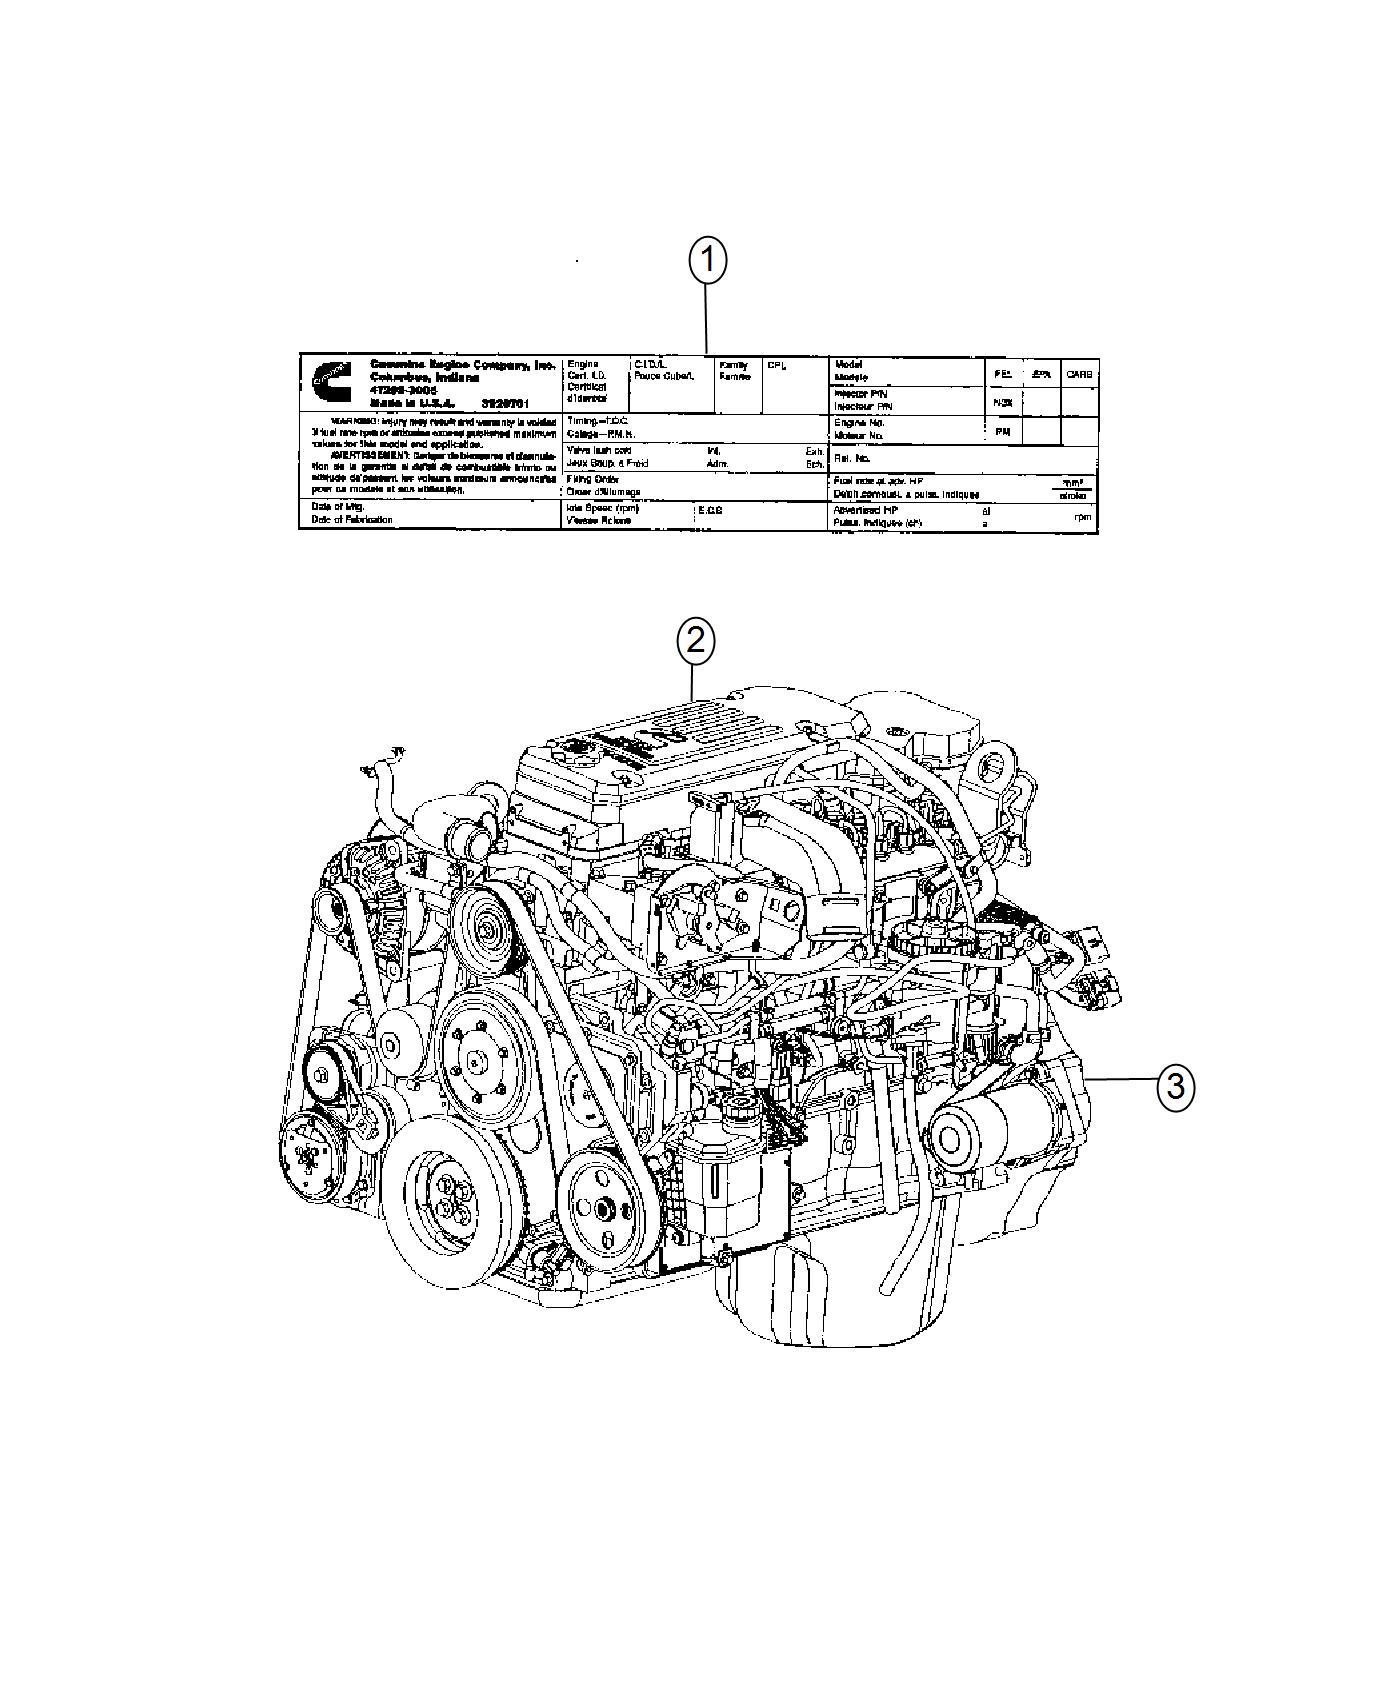 Dodge Ram Engine Complete Remanufactured Cpl